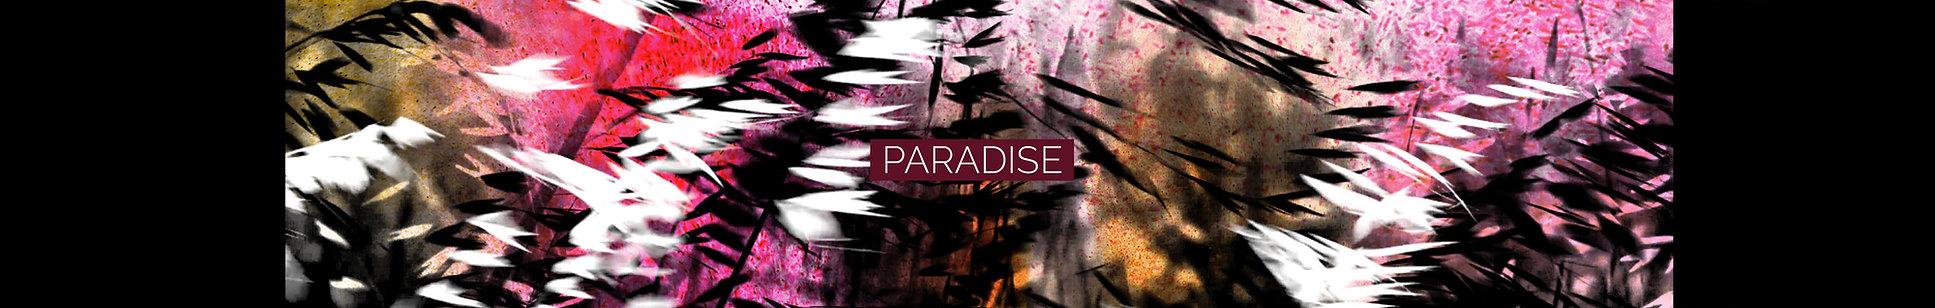 BANNERS_Paradise.jpg